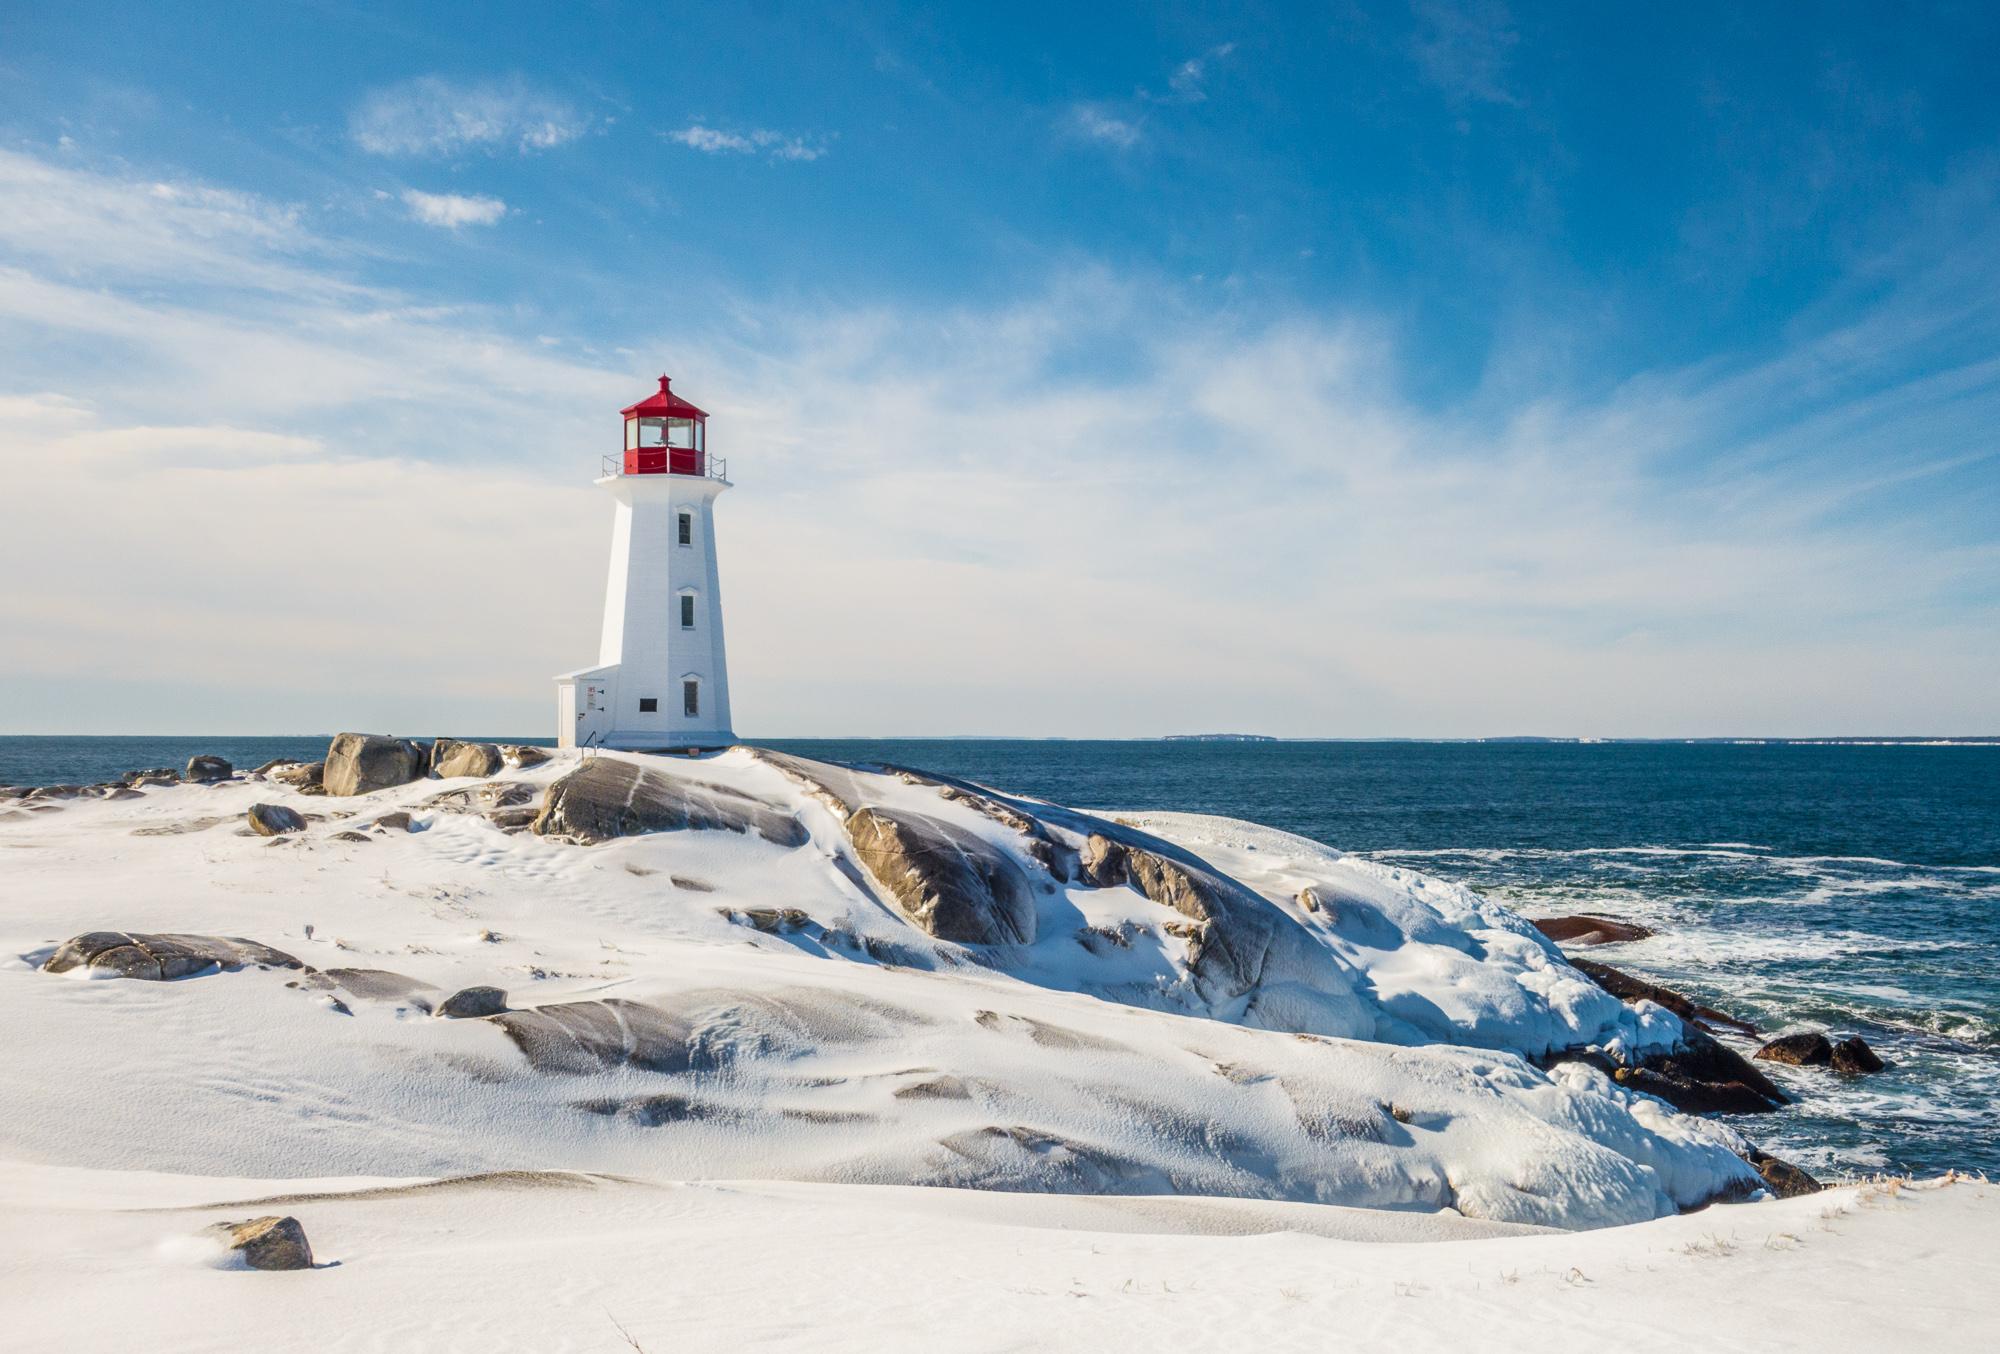 Winter at Peggy's Cove, Nova Scotia